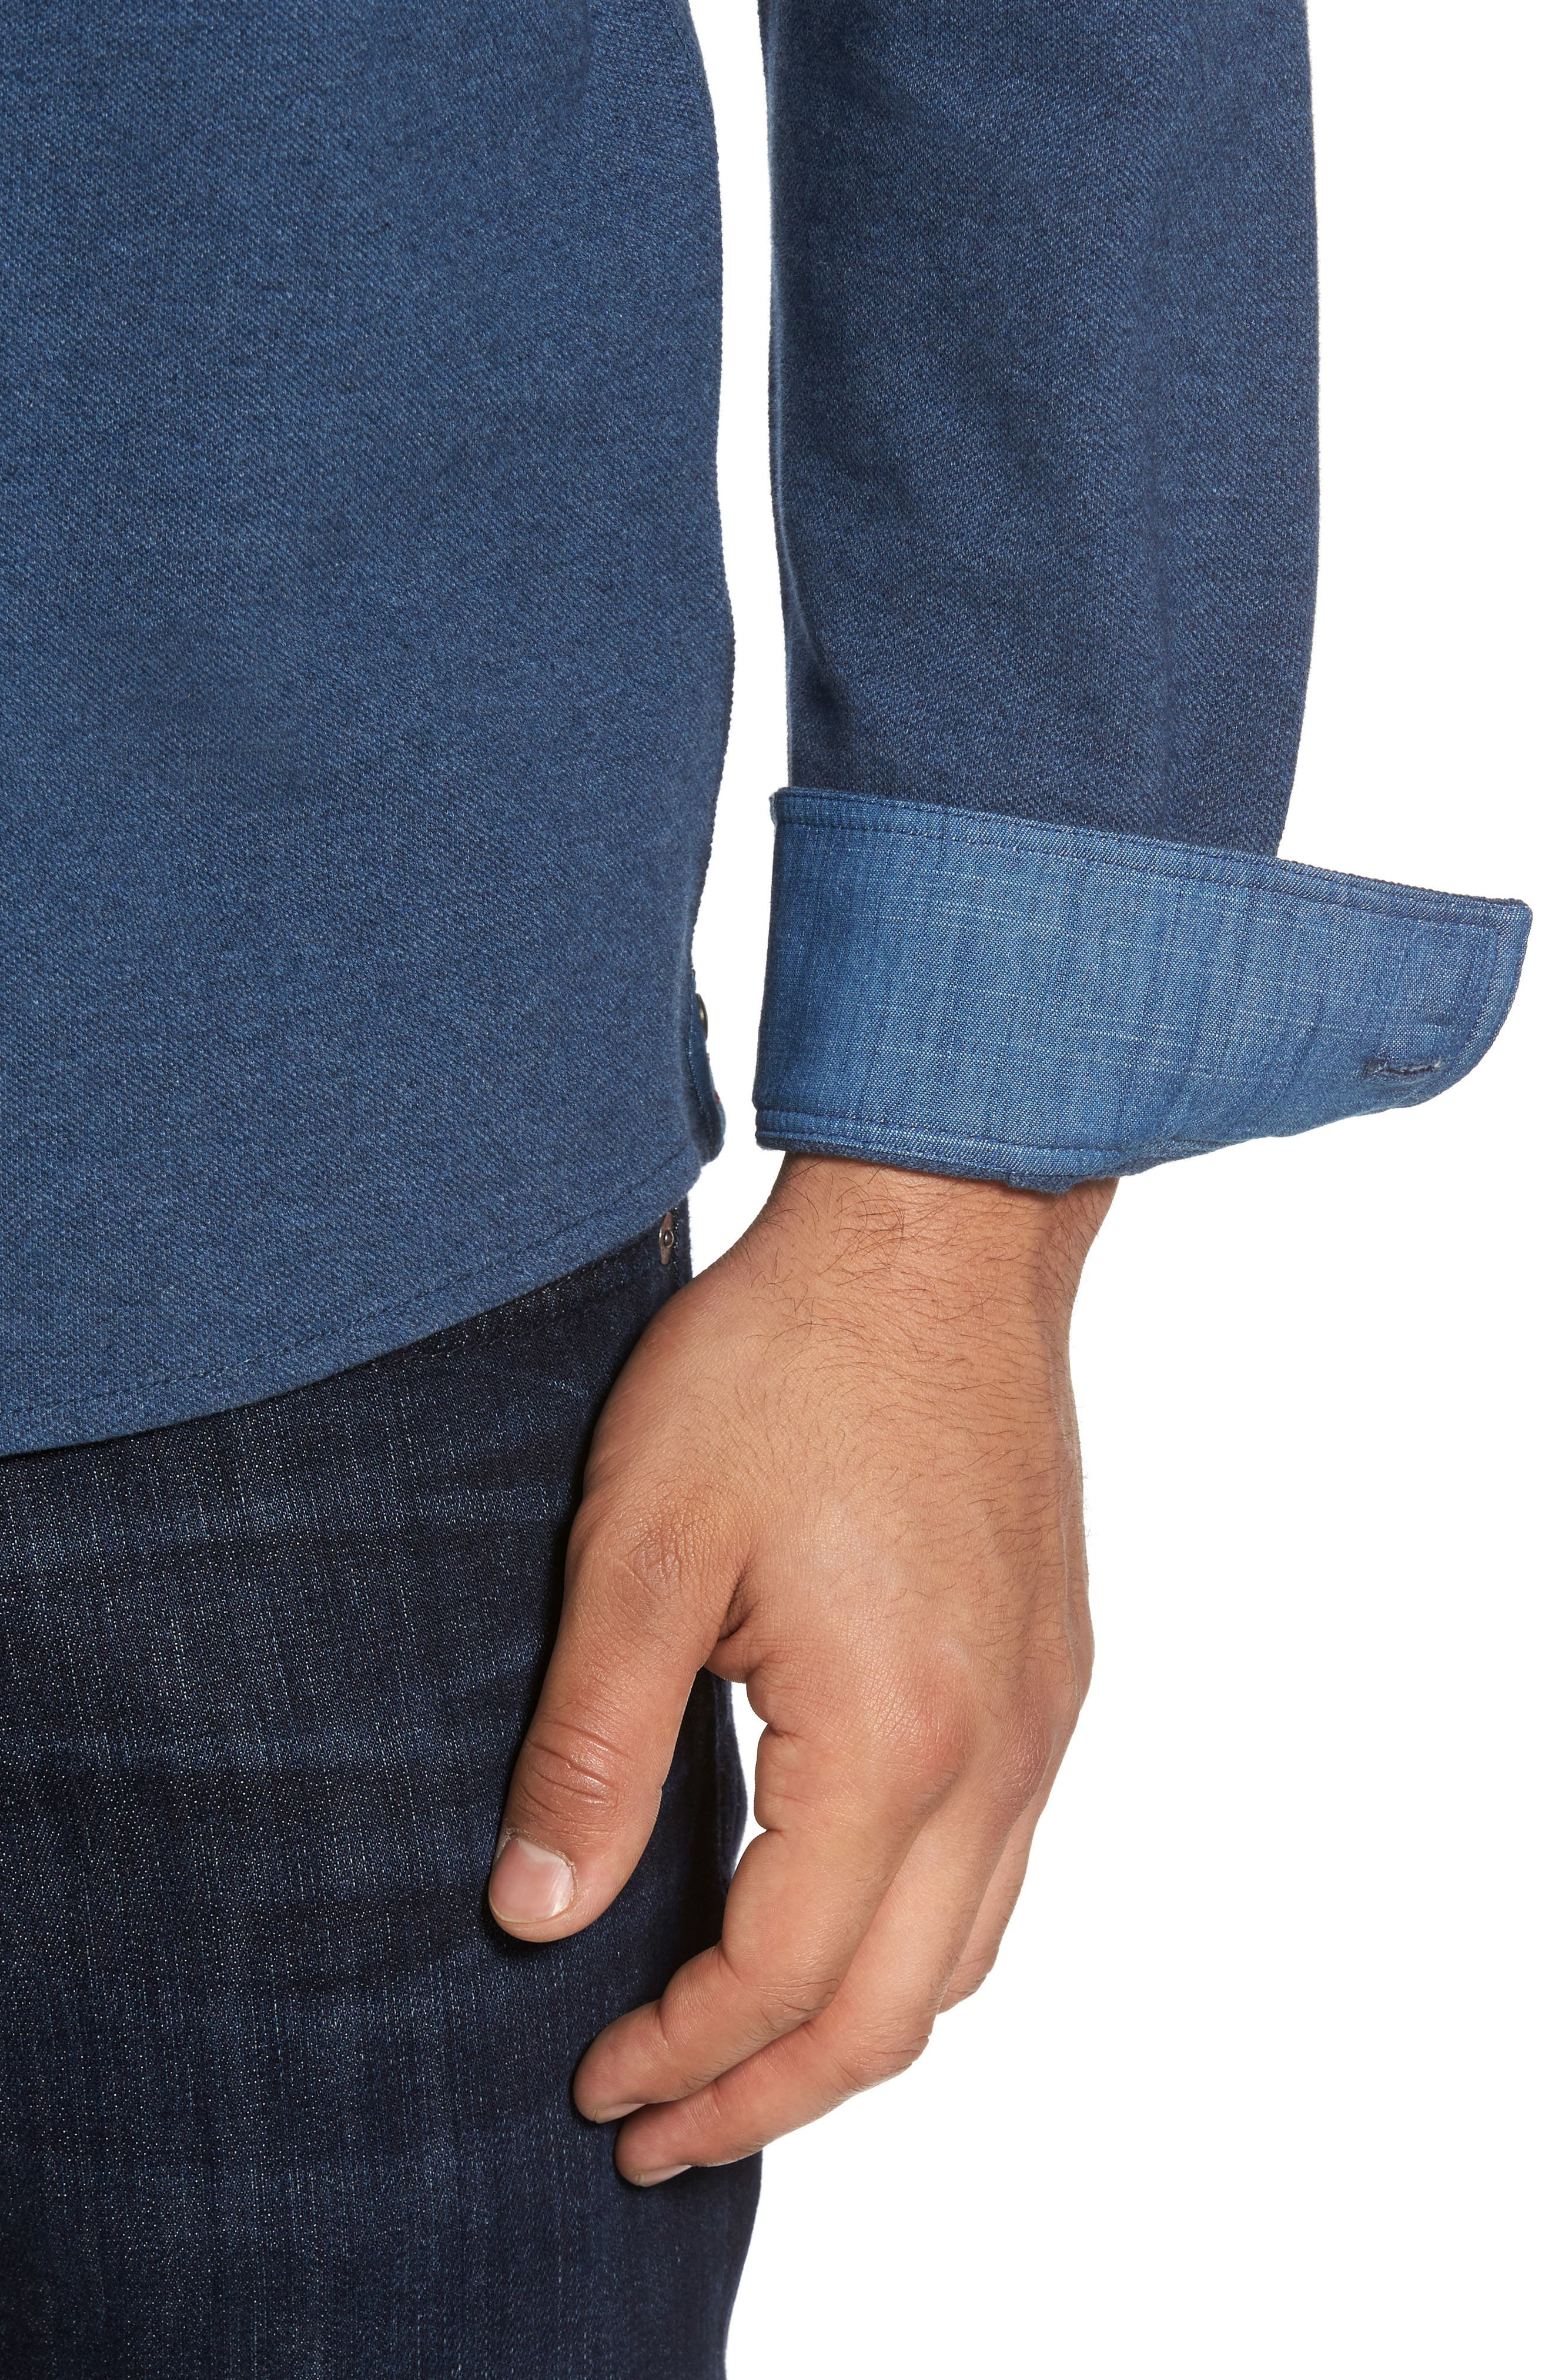 Shandy Heathered Knit Sport Shirt,                             Alternate thumbnail 8, color,